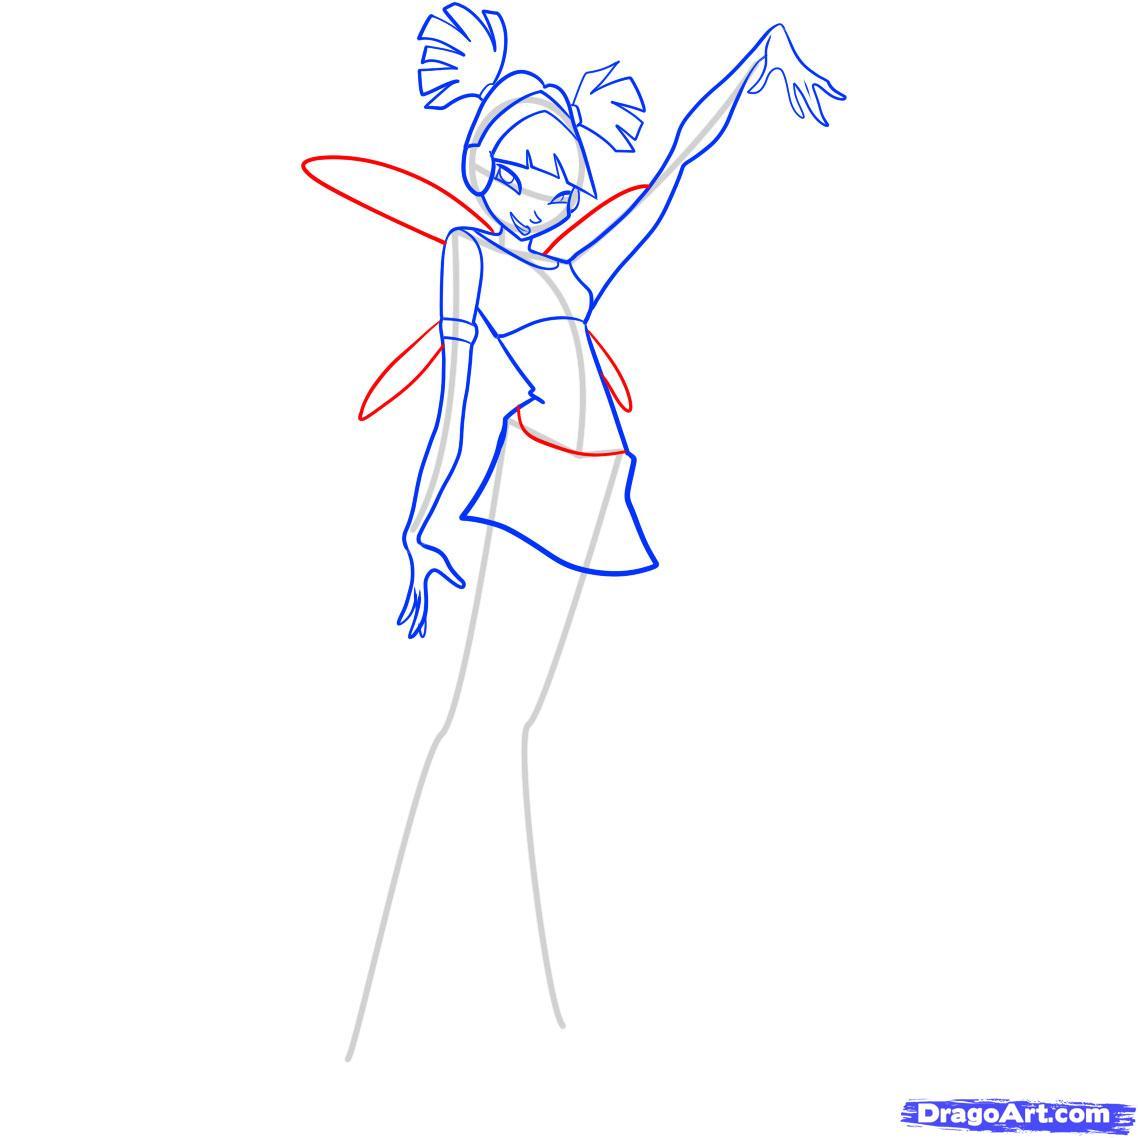 Как нарисовать Музу(Muza) из клуба Винкс(Winx) поэтапно